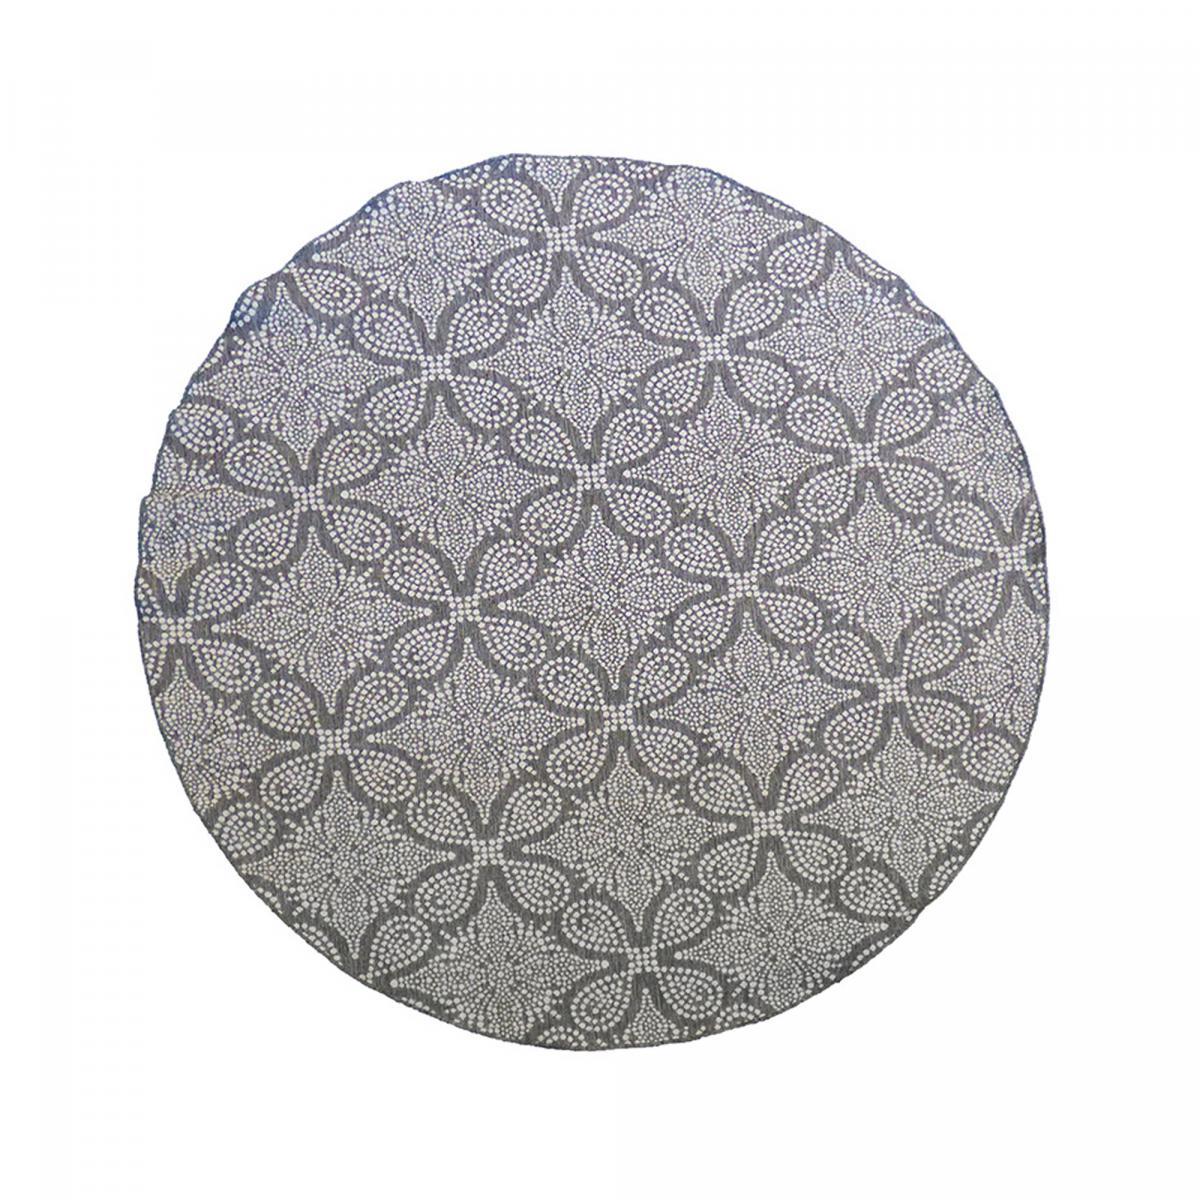 Tapis rond en polypropylène gris 240x240 rond